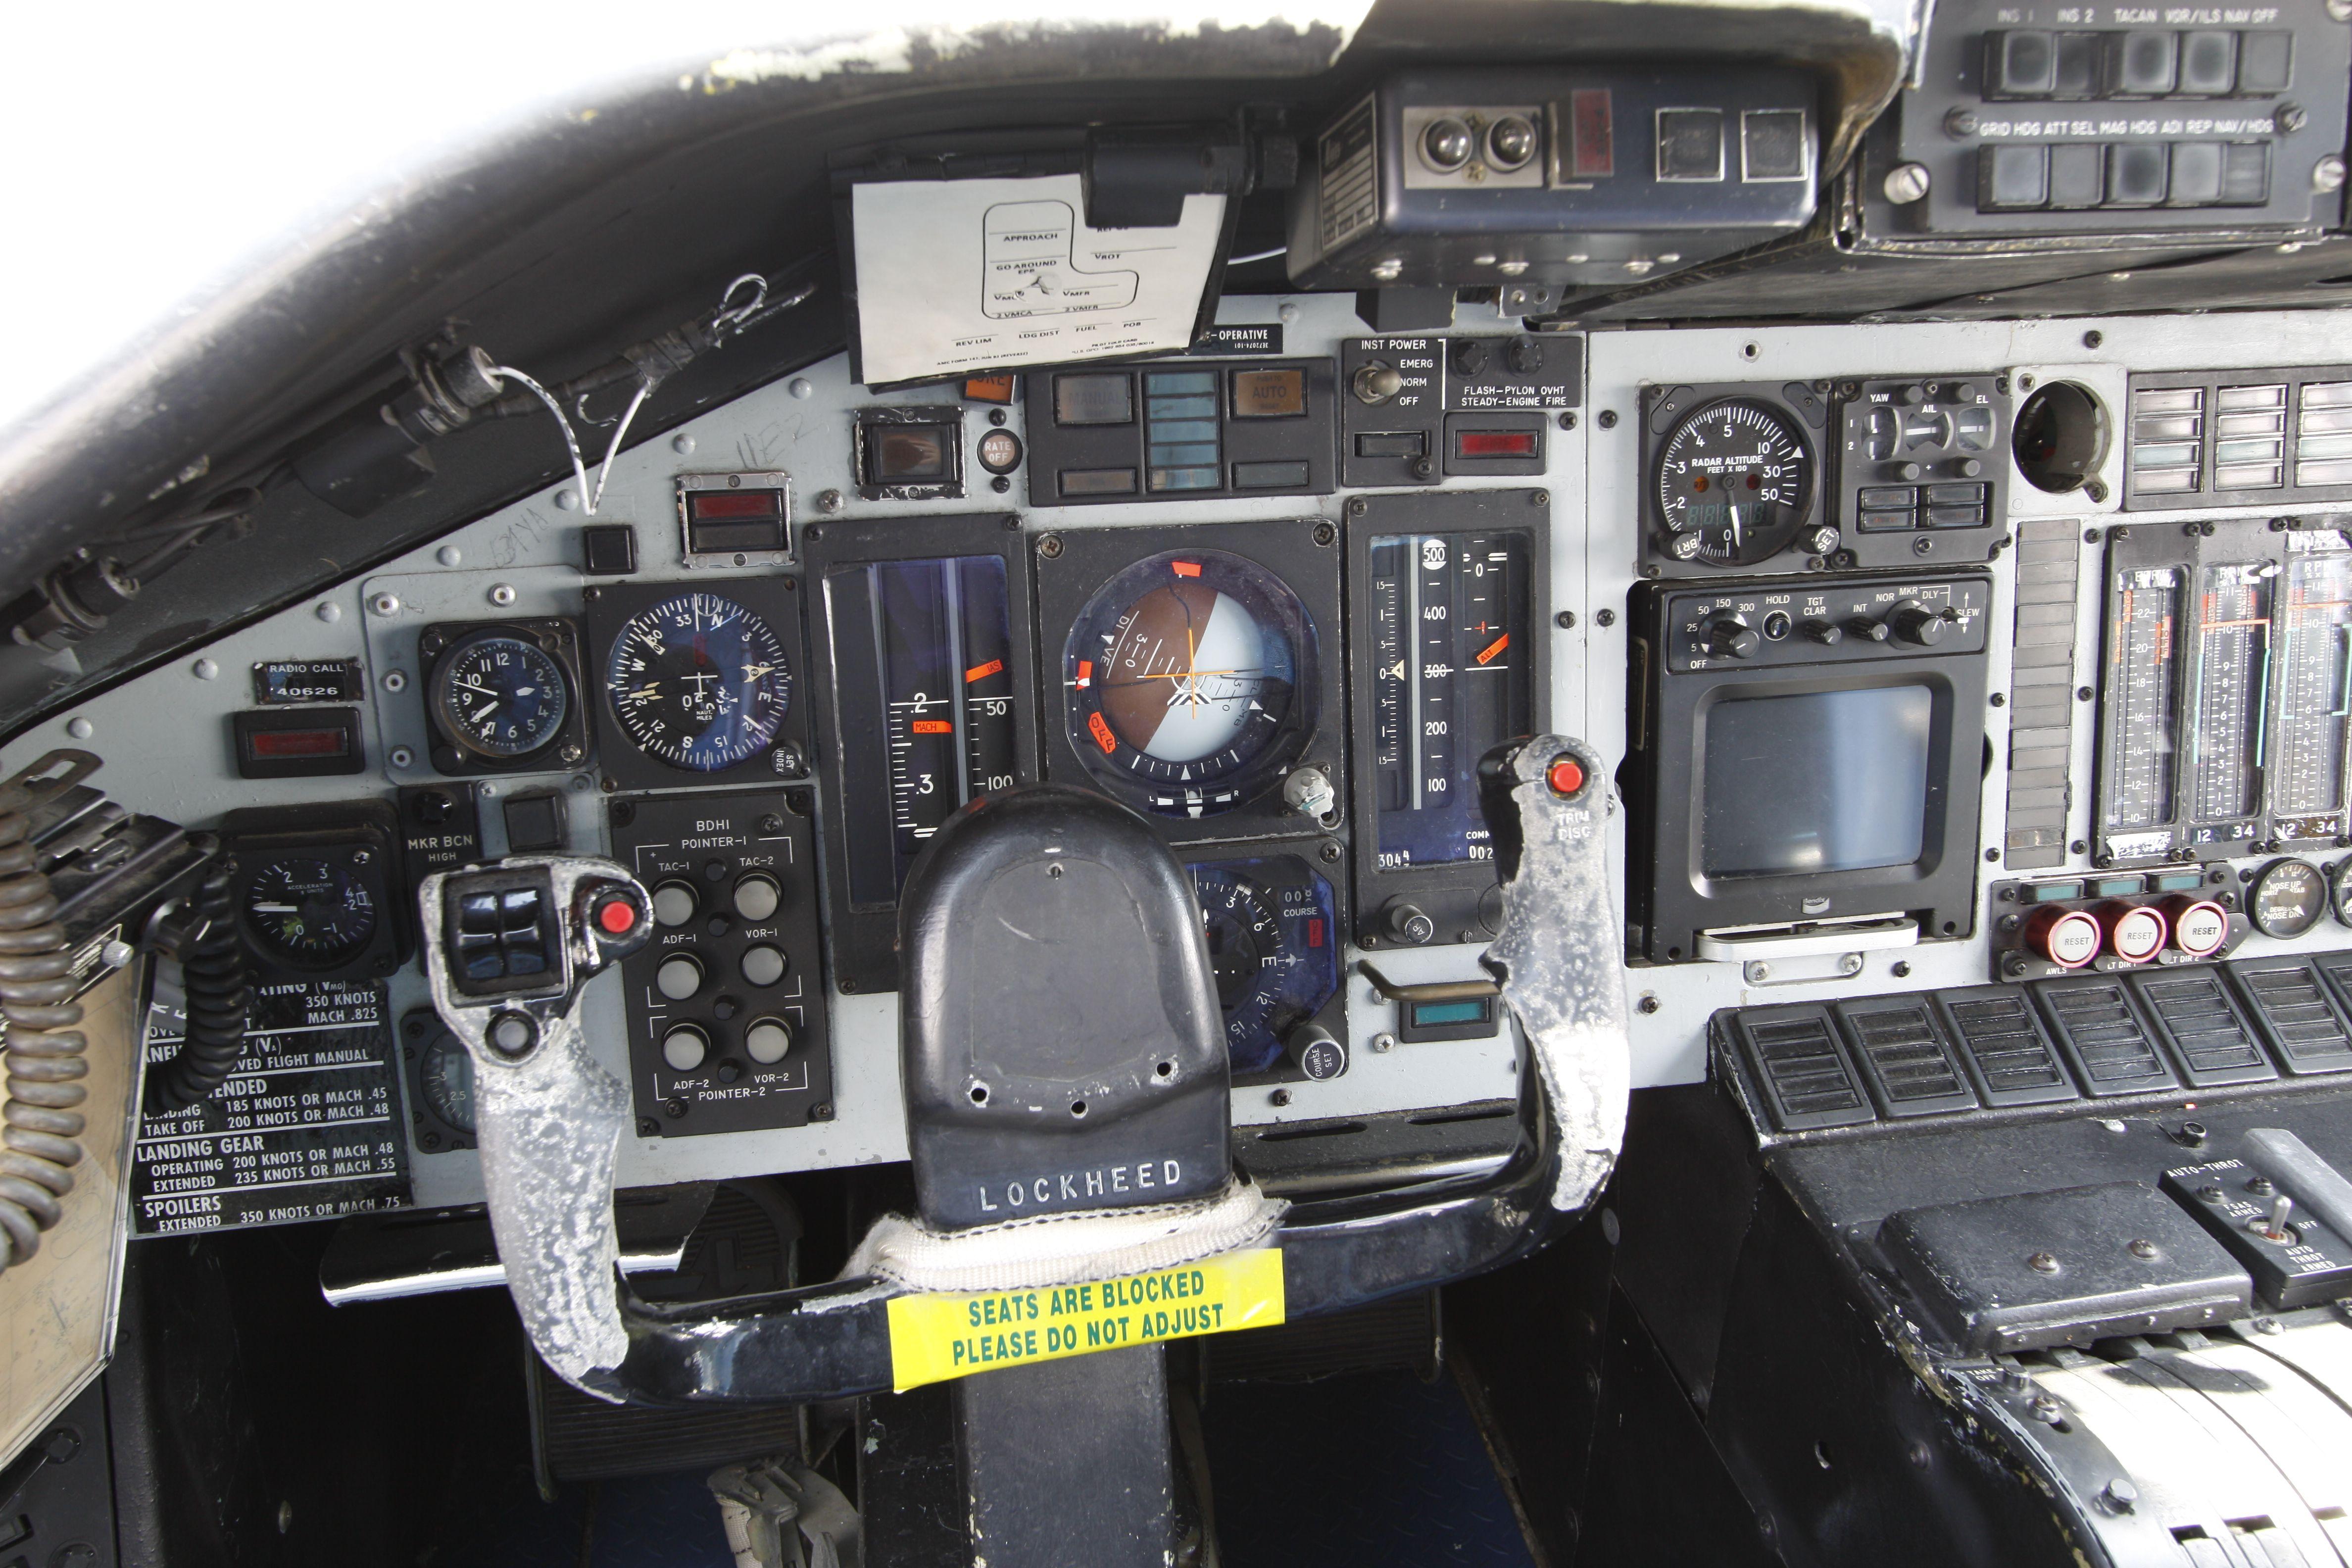 Lockheed C 141a B Starlifter Pilot Cockpit Cockpit Lockheed